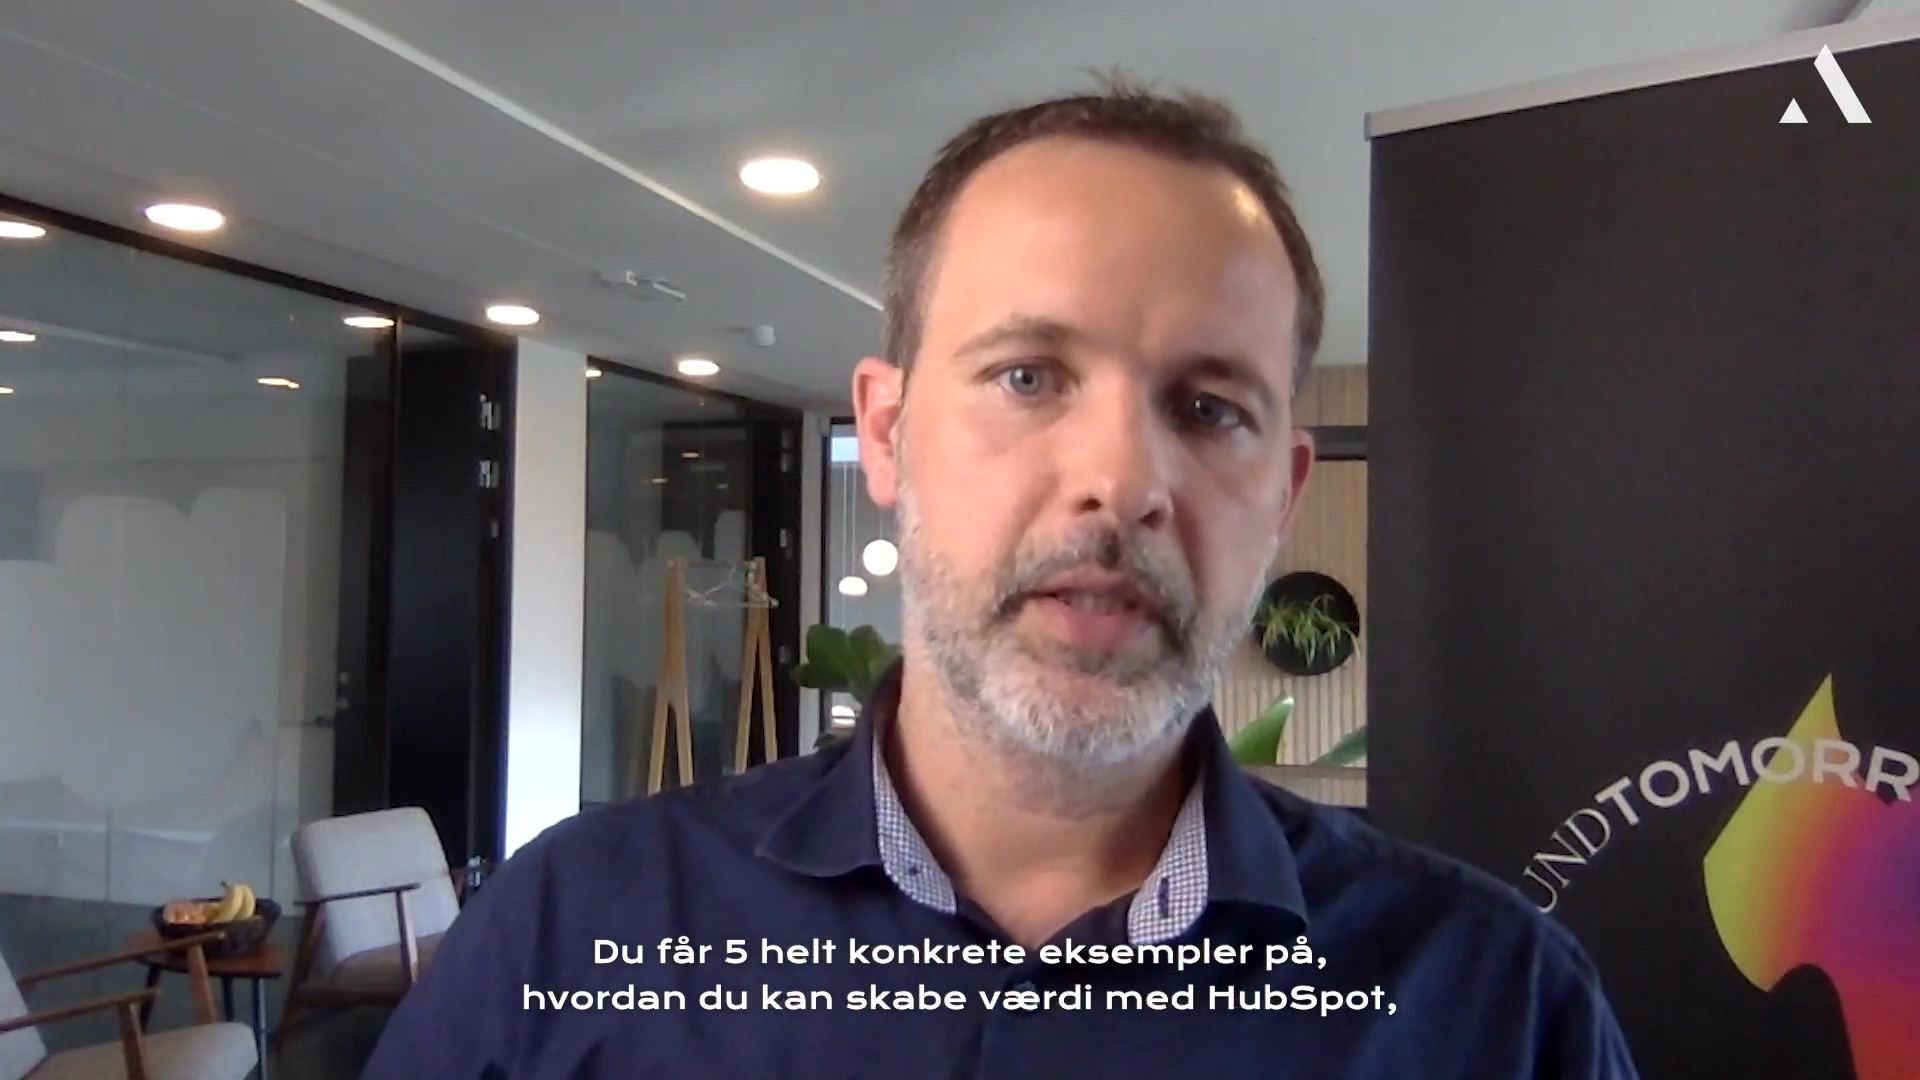 DK_Marketingchefens-guide-til-HS_small